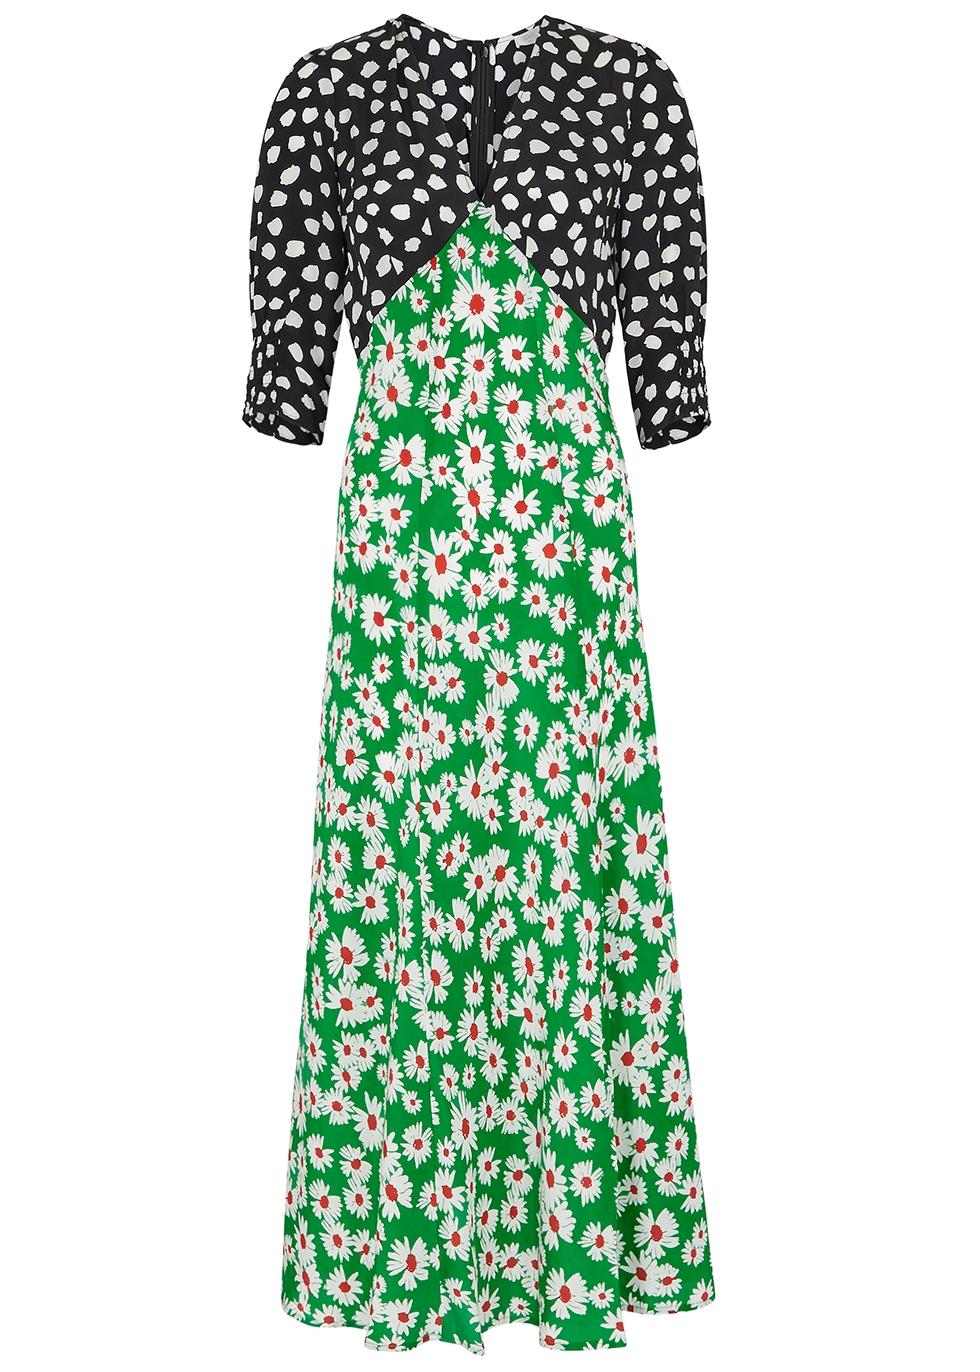 67adc8c1be6f Designer Dresses   Designer Gowns - Harvey Nichols